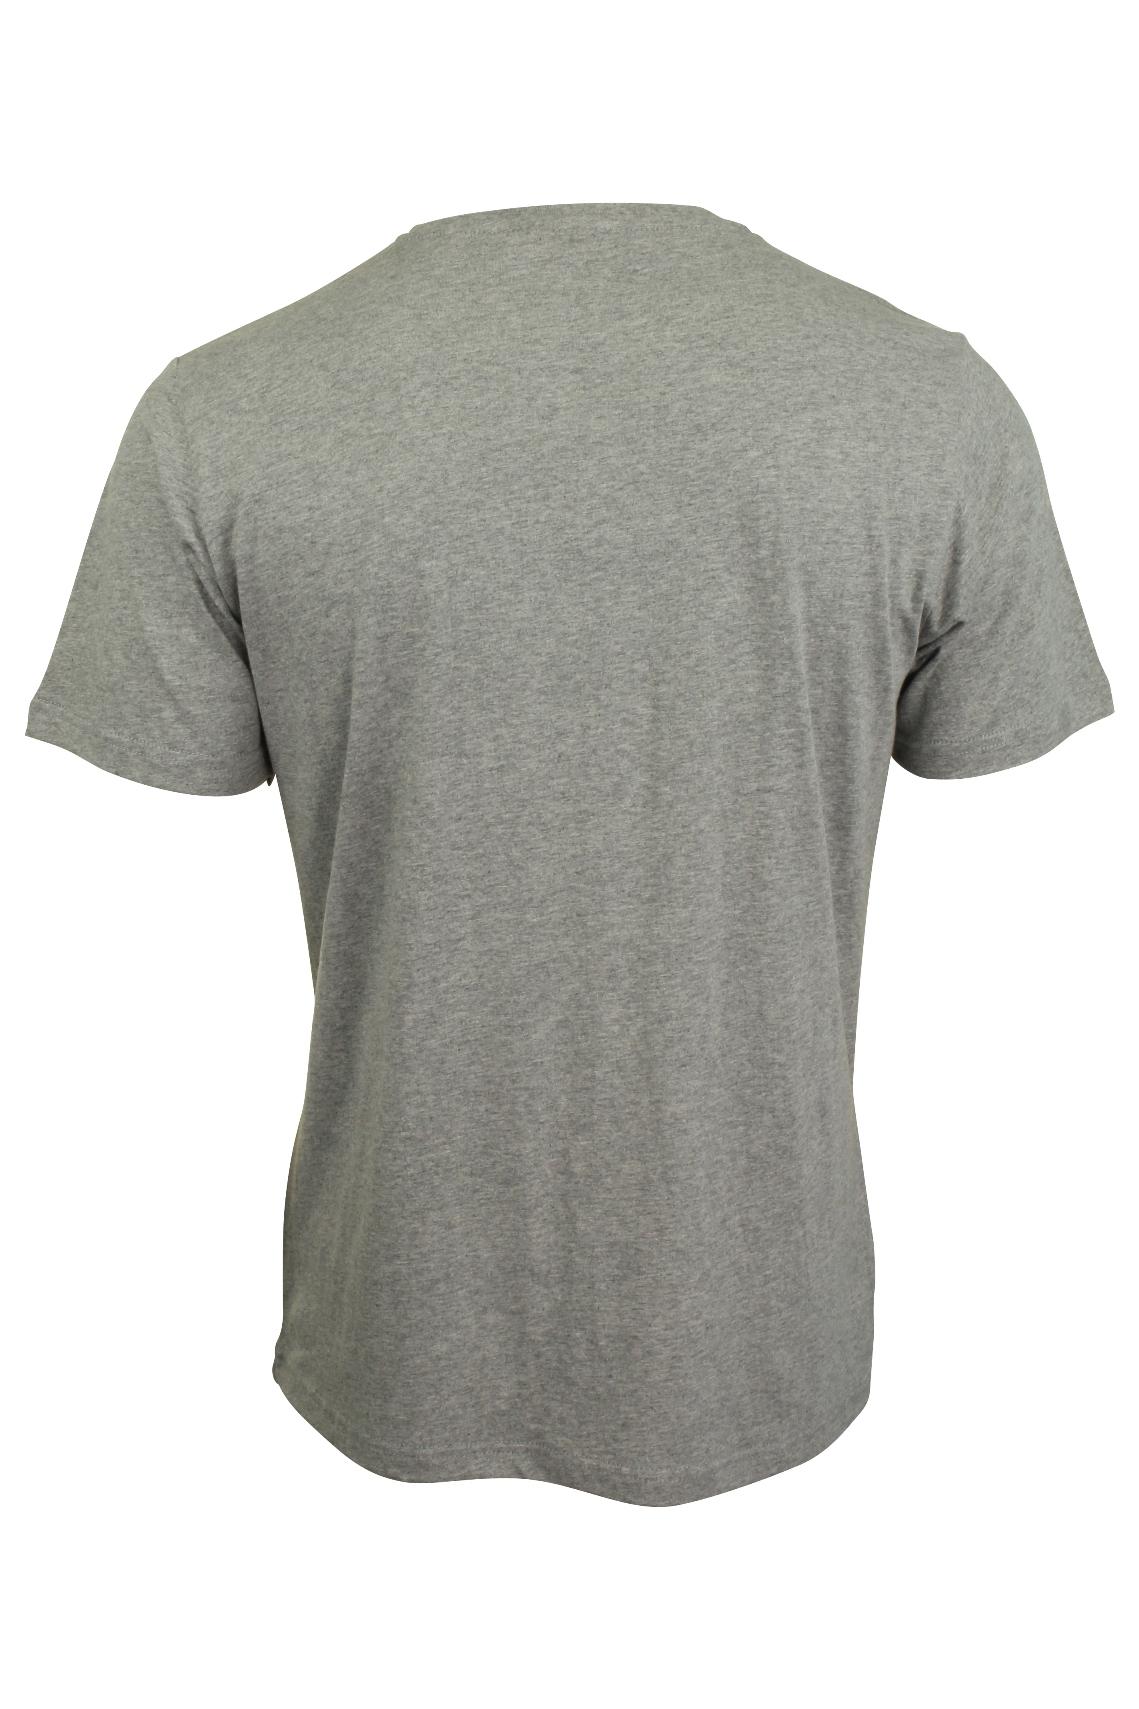 a1d48deb Mens Ellesse T-Shirt 'Prado' Short Sleeved